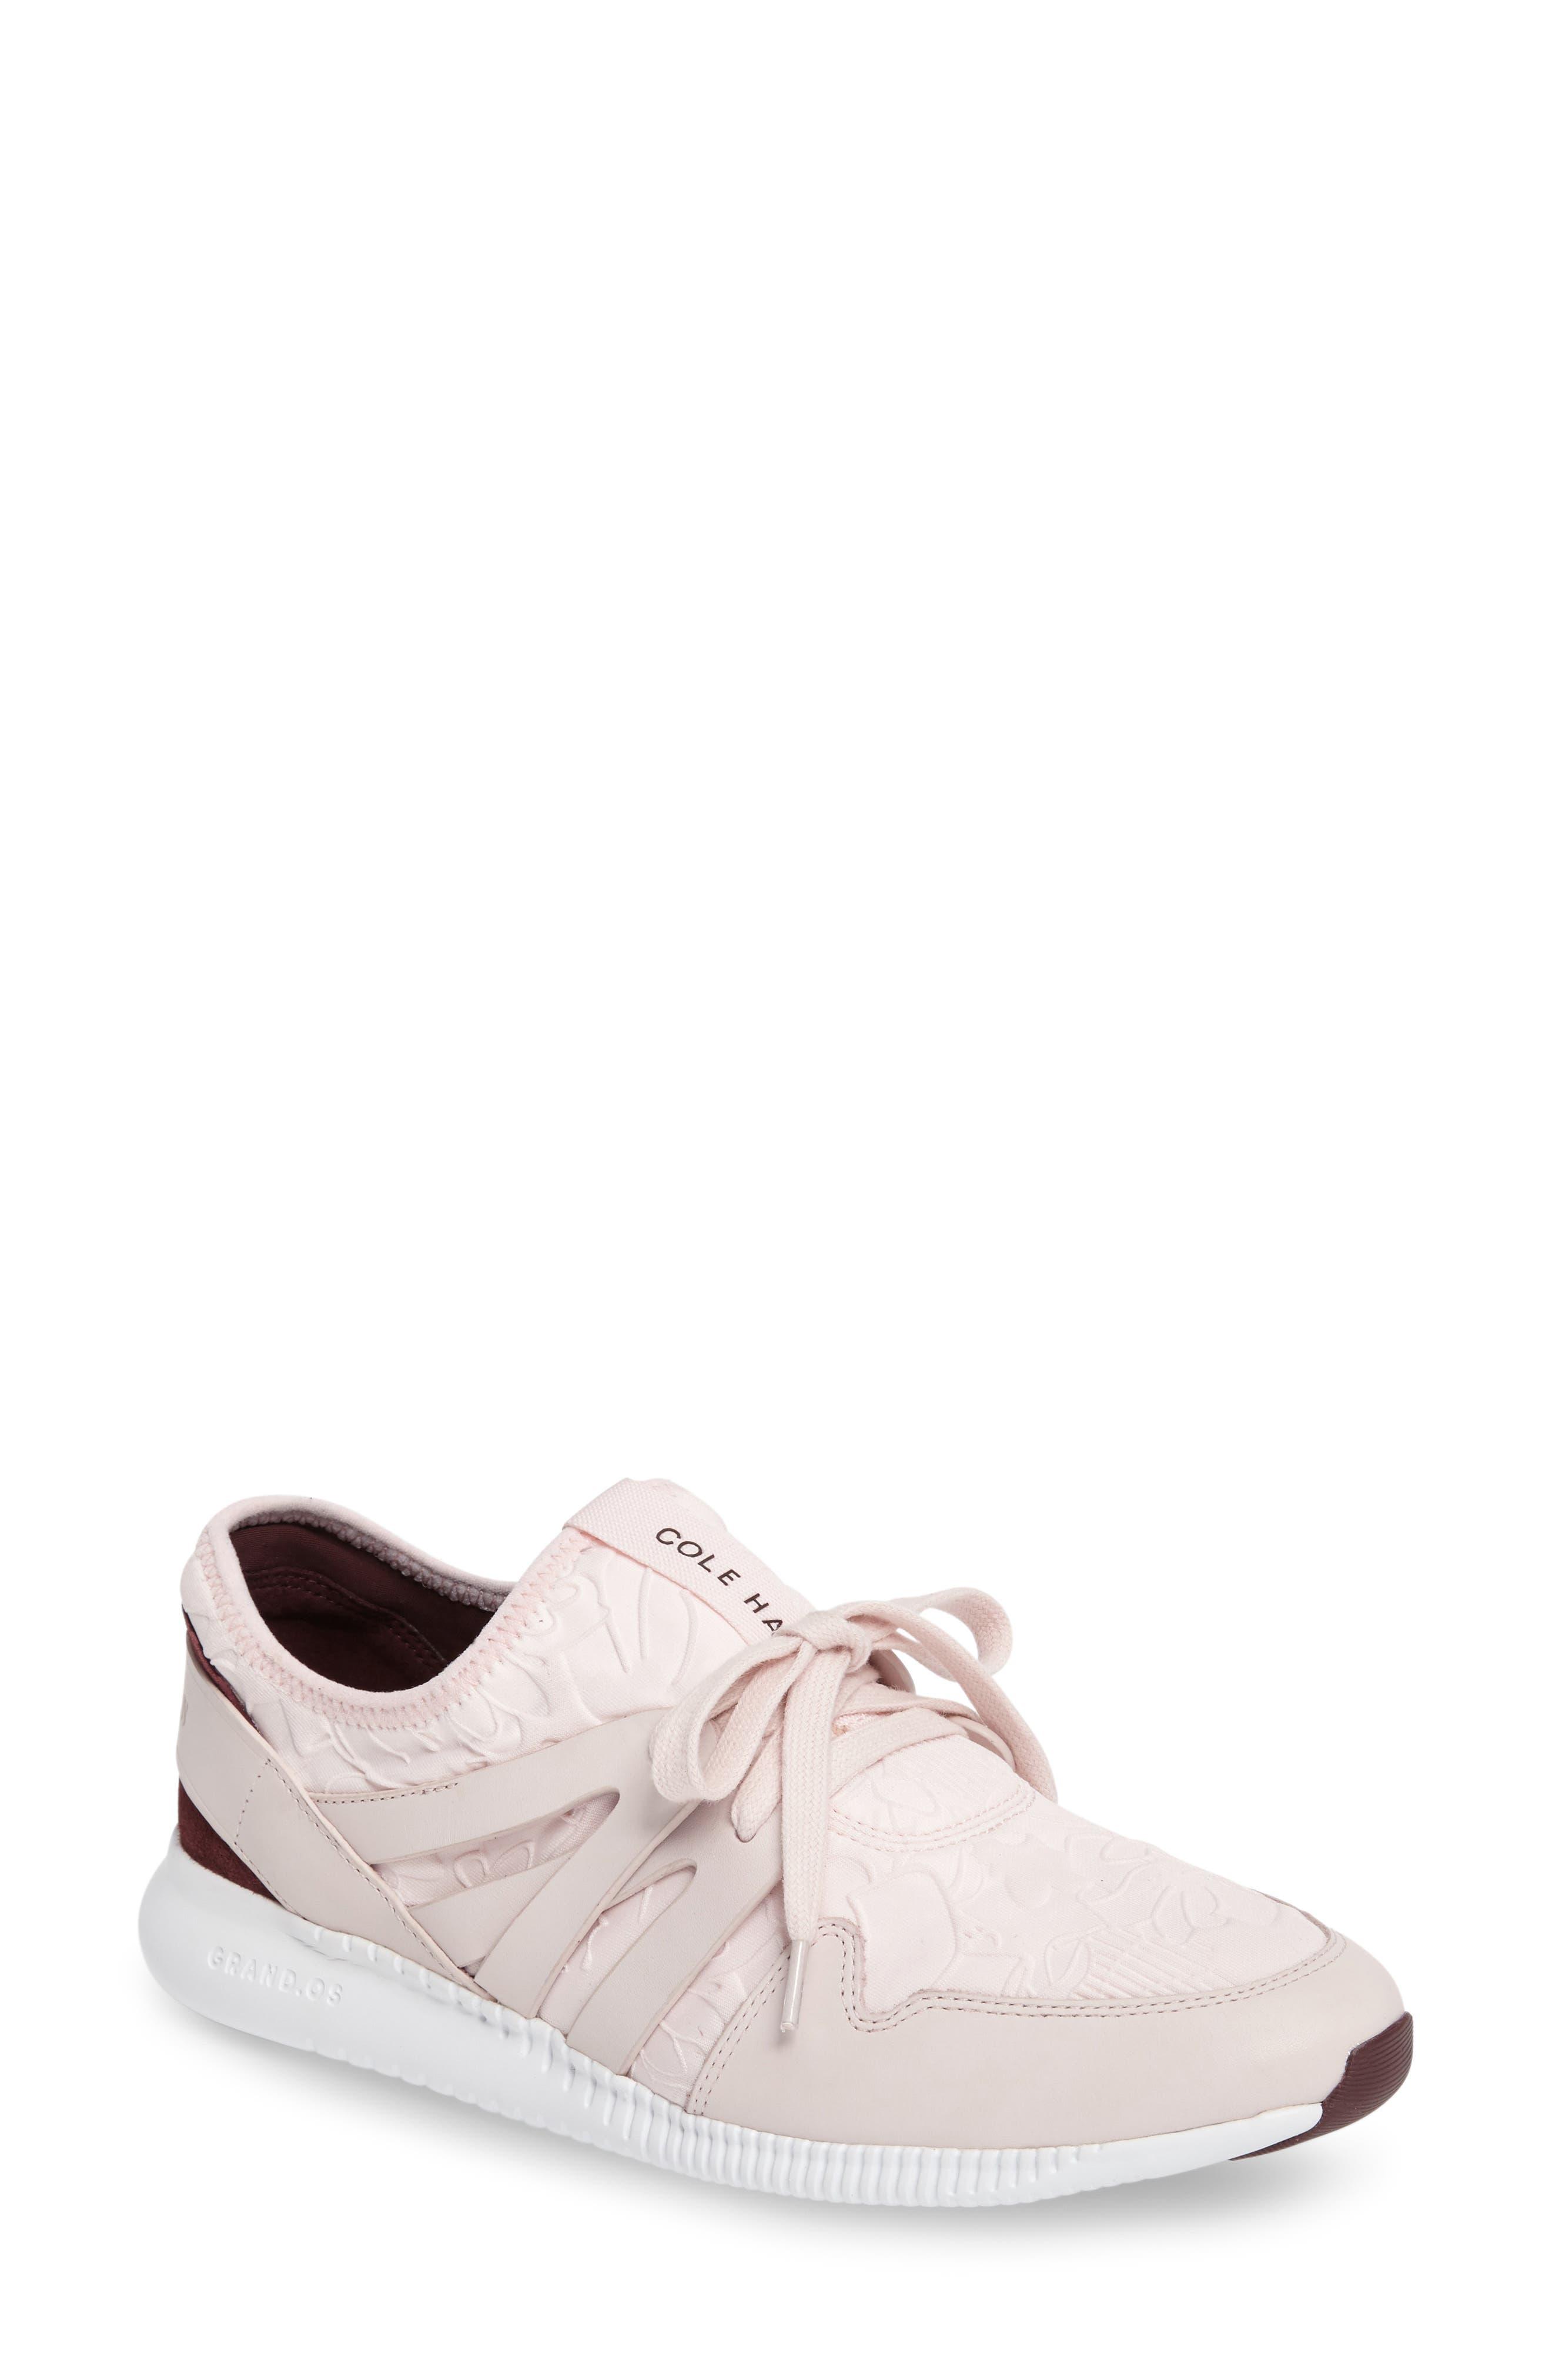 'StudioGrand' Sneaker,                             Main thumbnail 8, color,